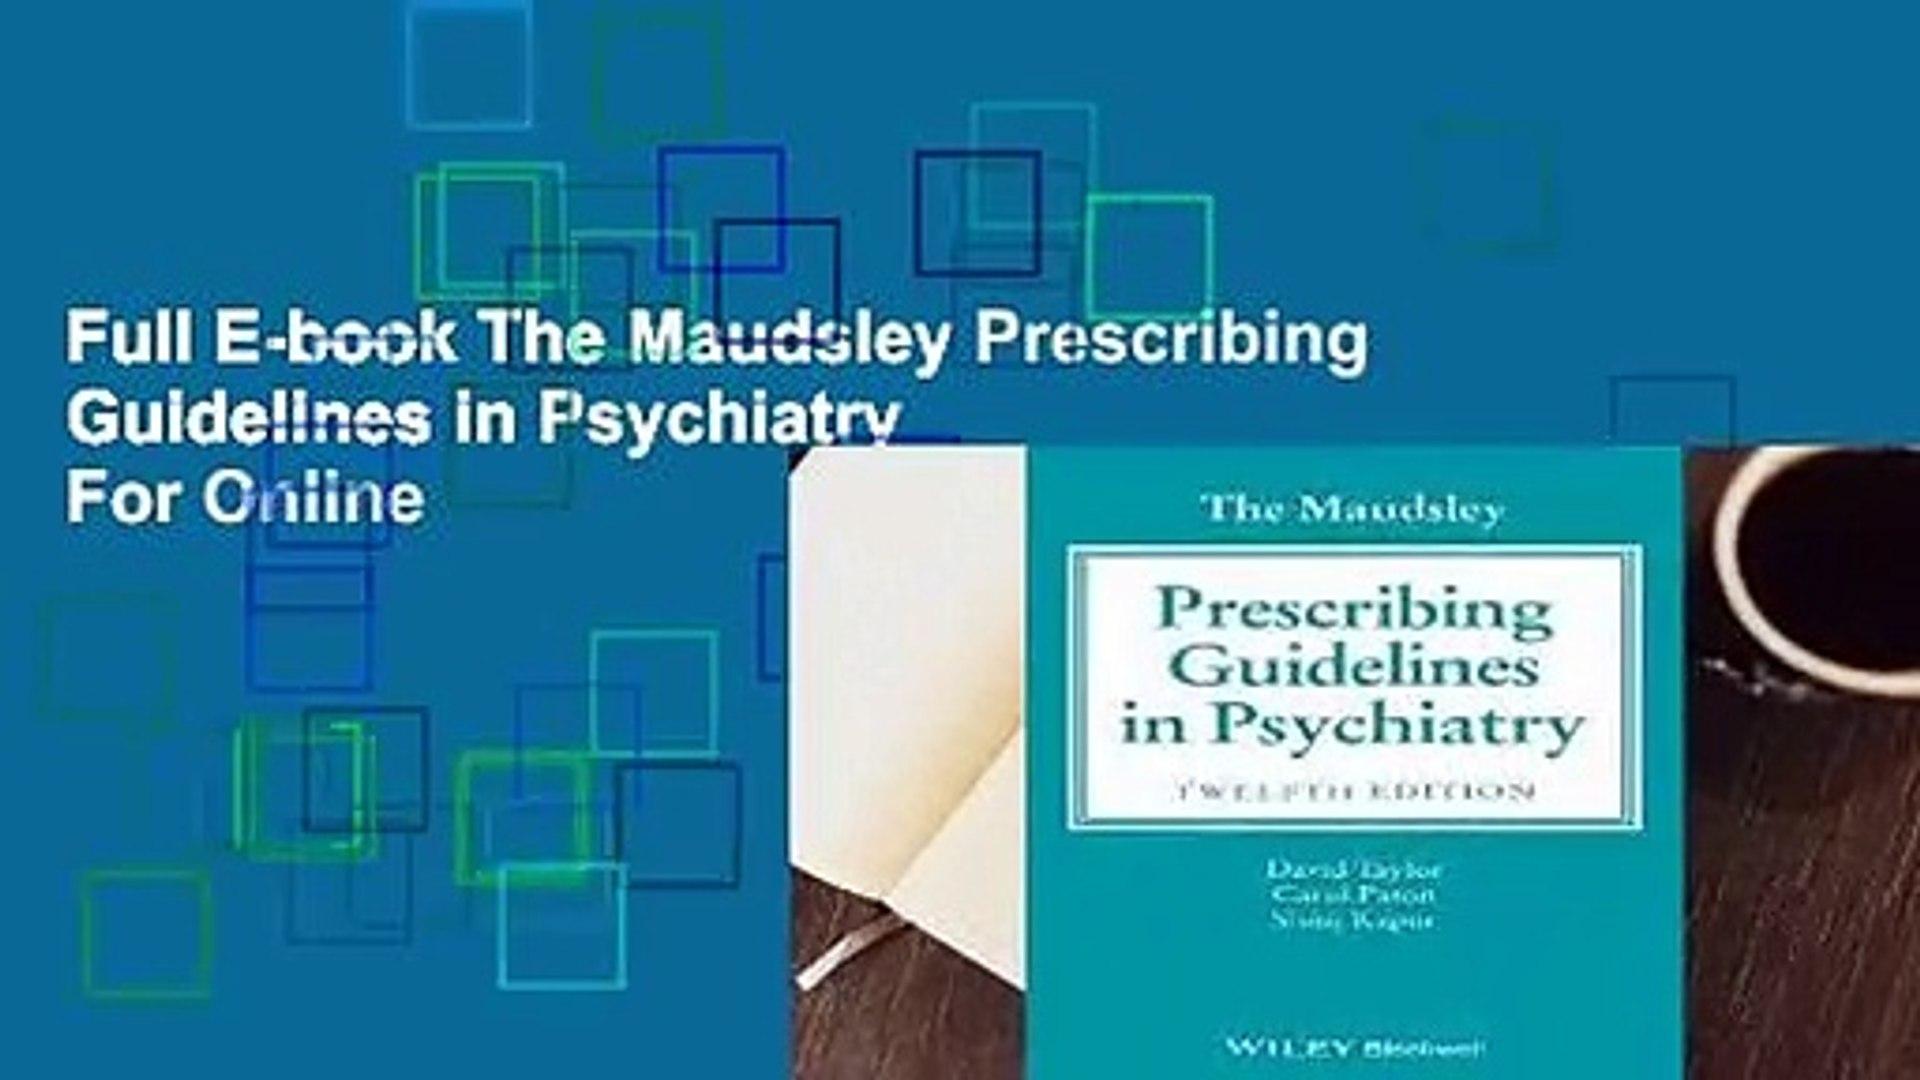 maudsley prescribing guidelines 12th edition pdf free download